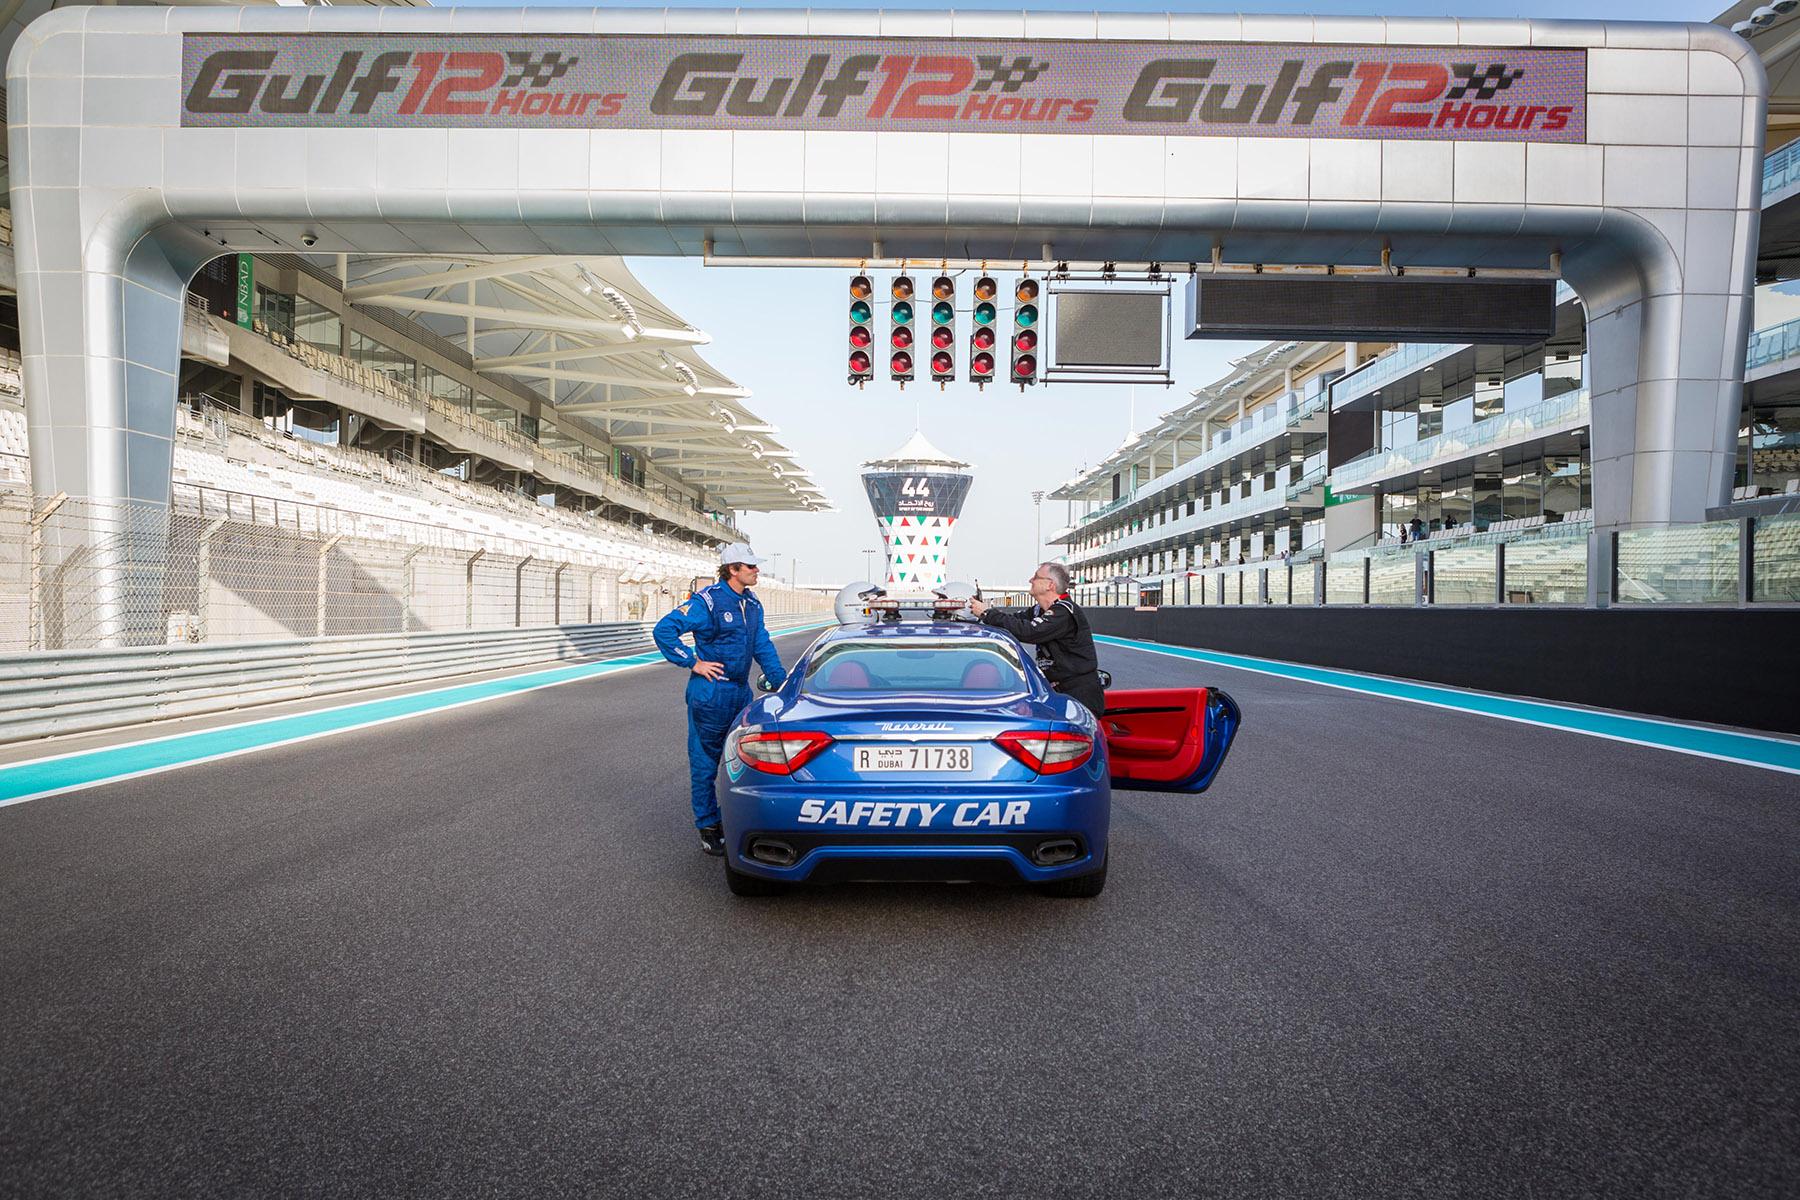 Safety car at Yas Marina Circuit at the Maserati Trofeo event by Loesje Kessels Fashion Photographer Dubai